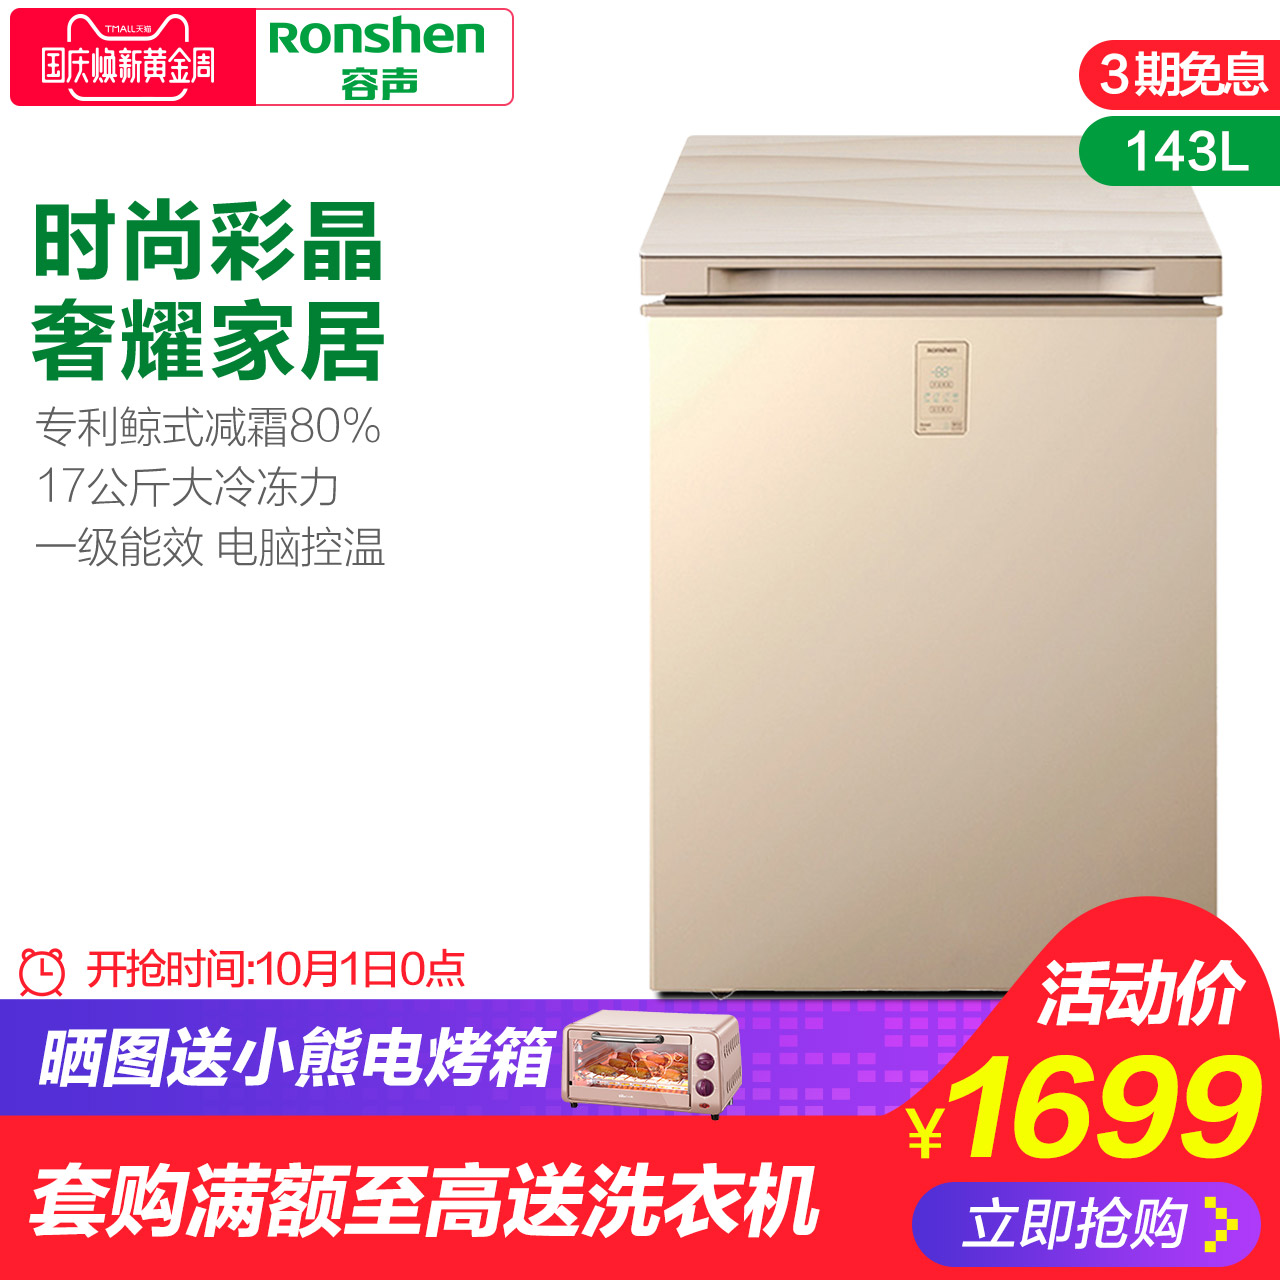 Ronshen-容声 BD-BC-143MGY-A 单温冰柜家用顶开门小型冷冻冷柜